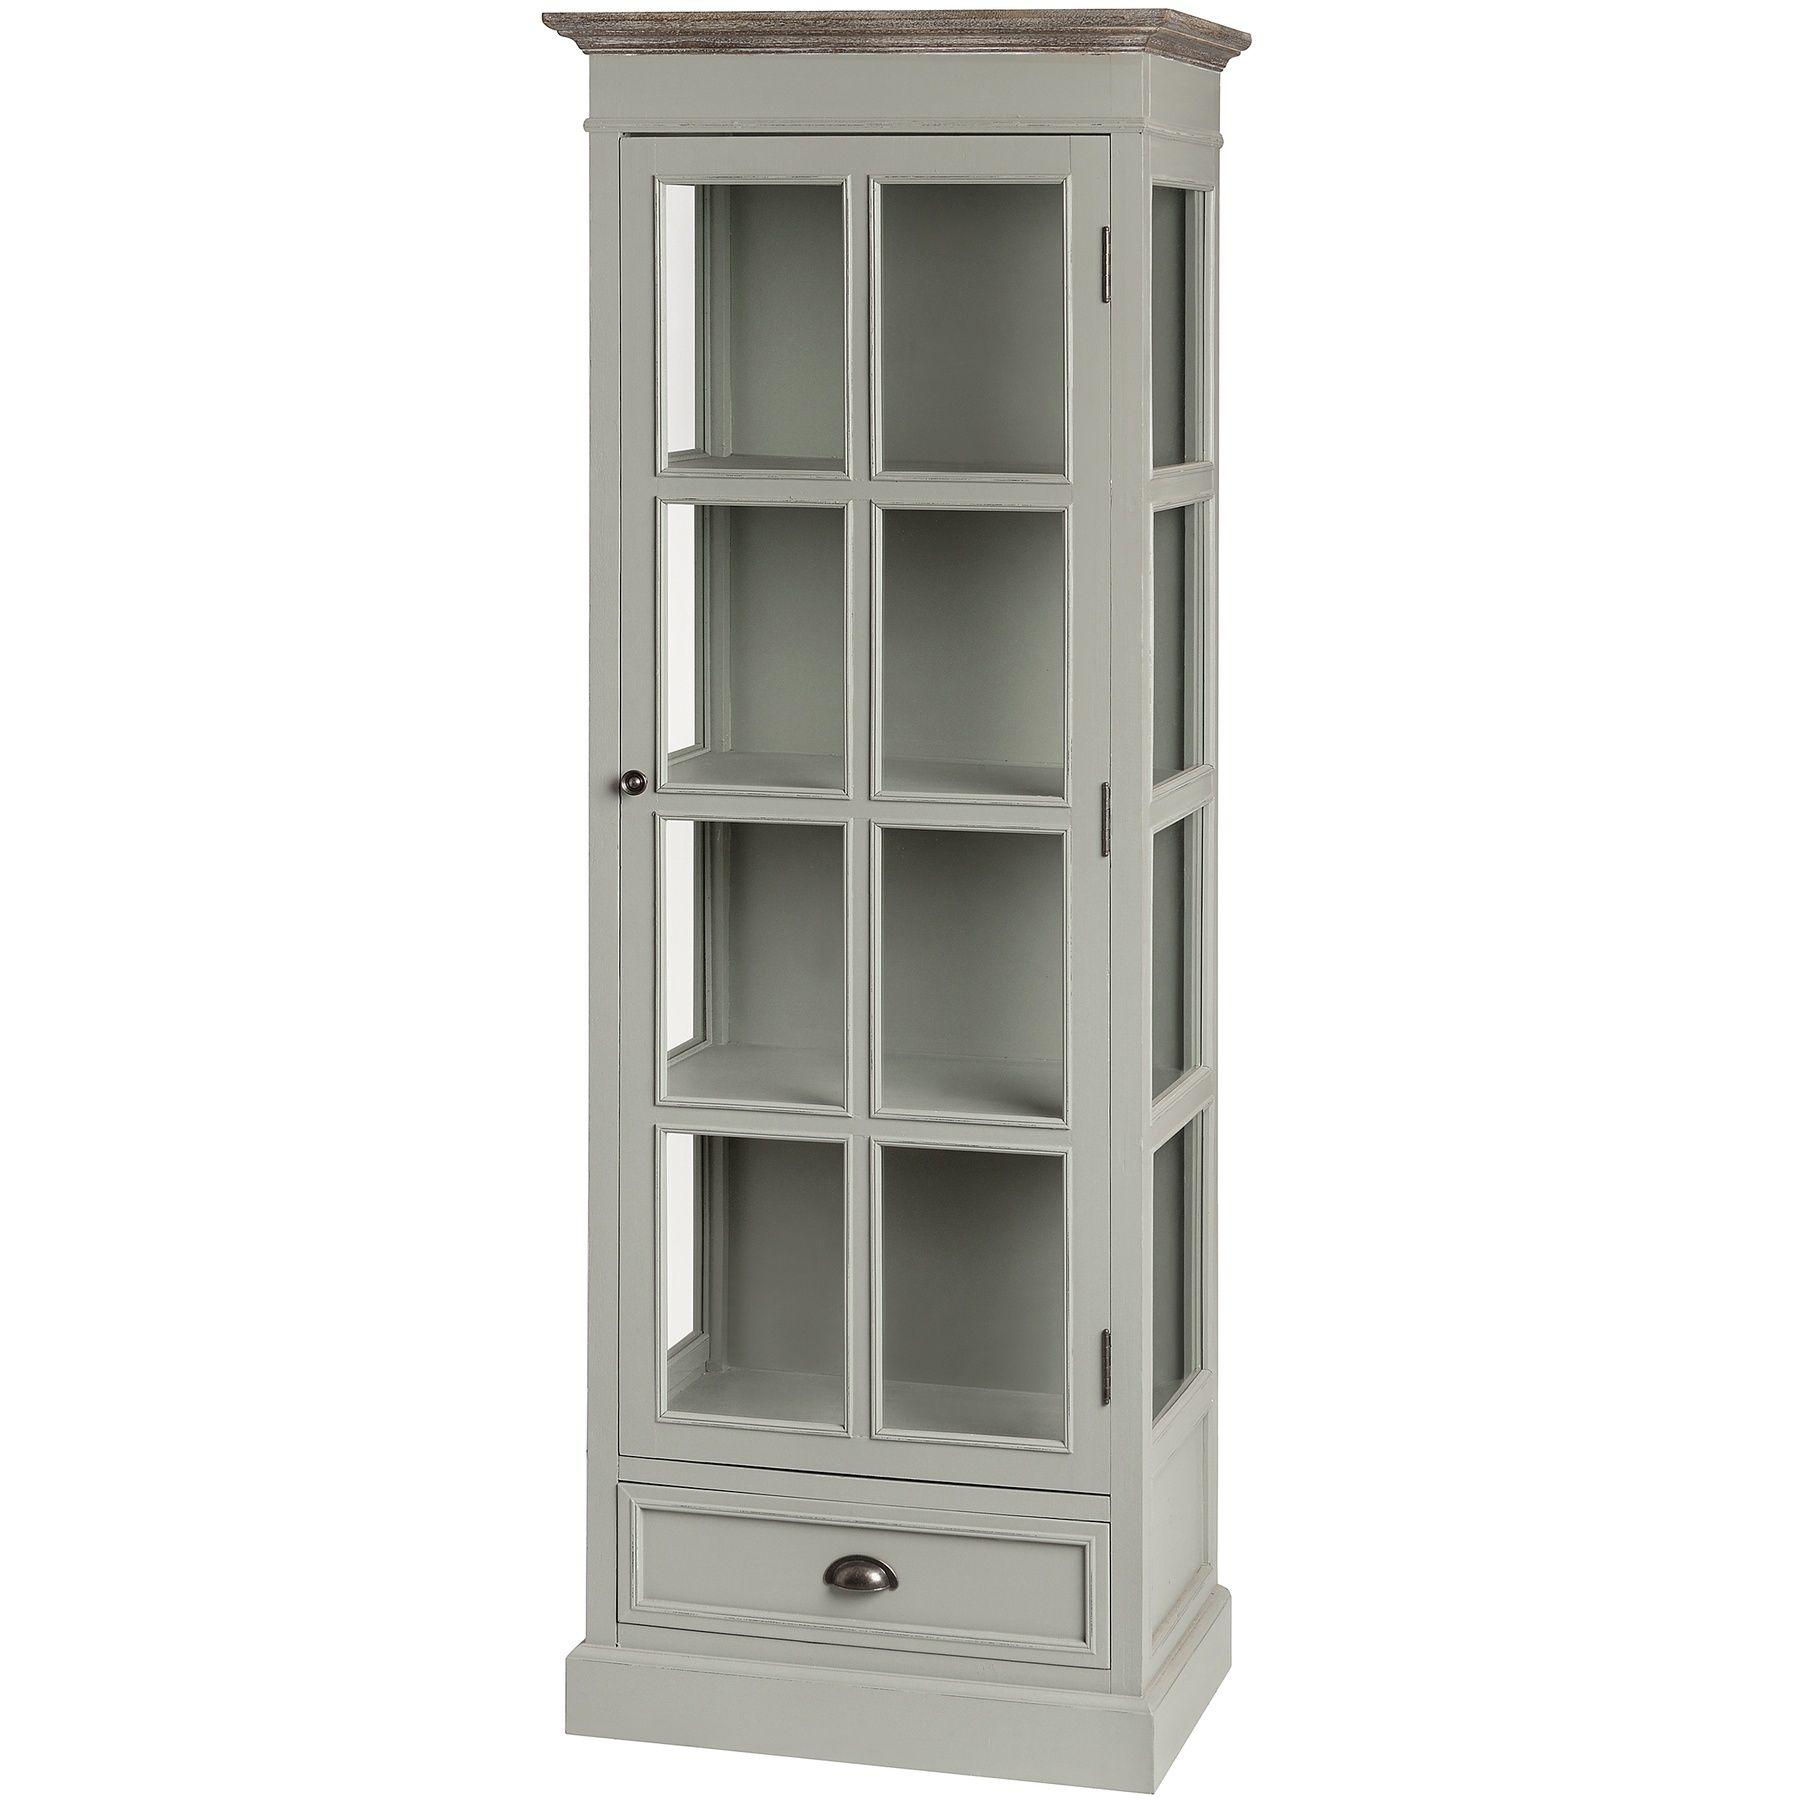 Merveilleux New Lyon Tall Glazed Display Cabinet